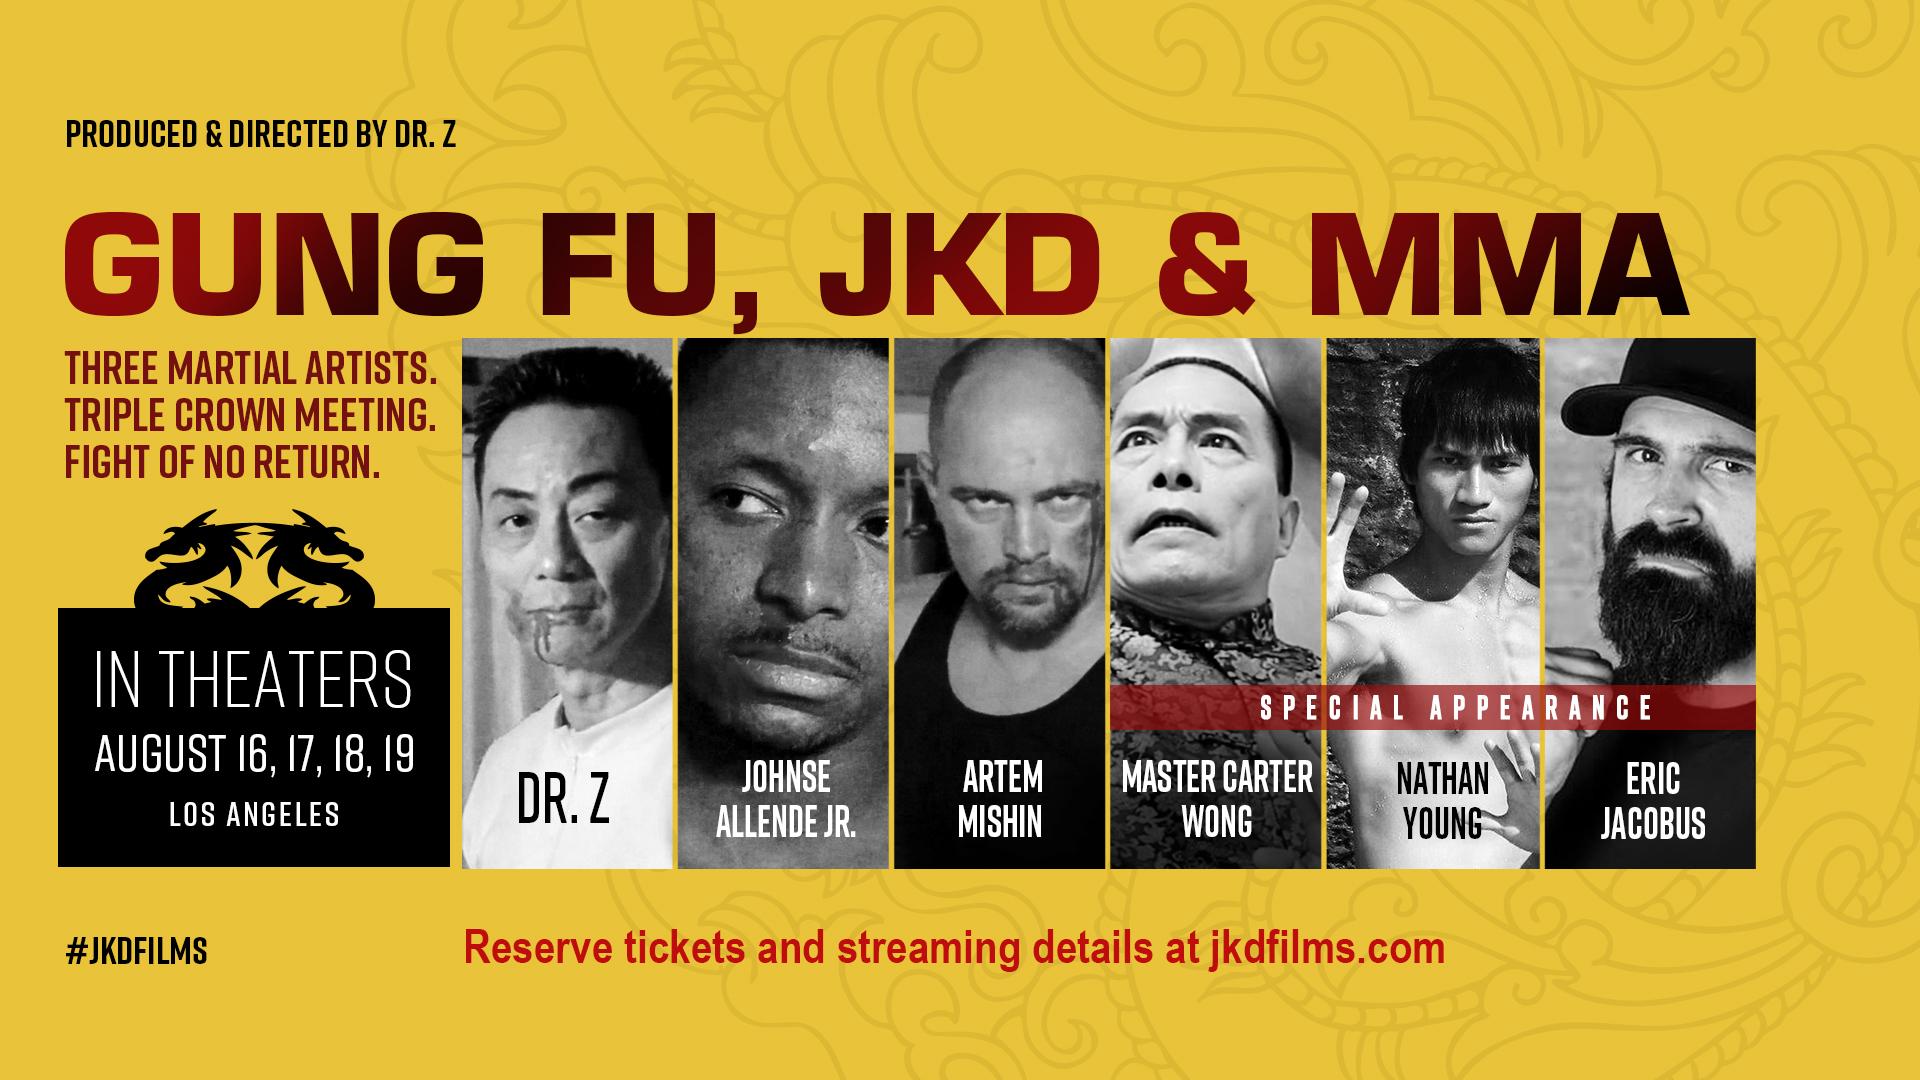 Gung-Fu-JKD-and-MMA-FB-Event.jpg